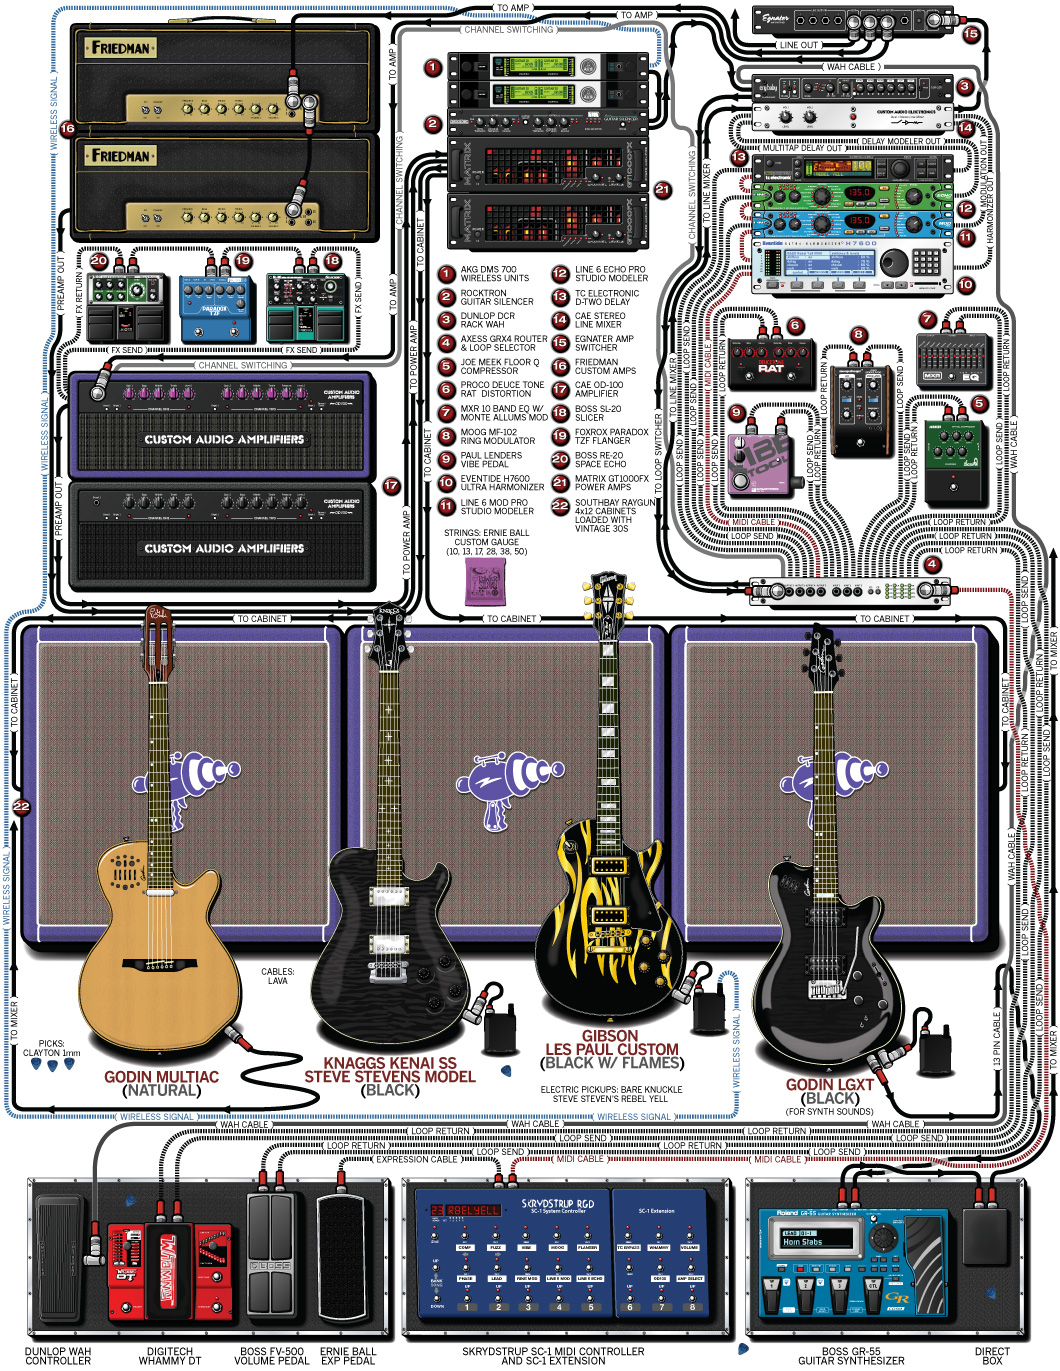 Steve Stevens Guitar Gear & Rig – Billy Idol – 2012